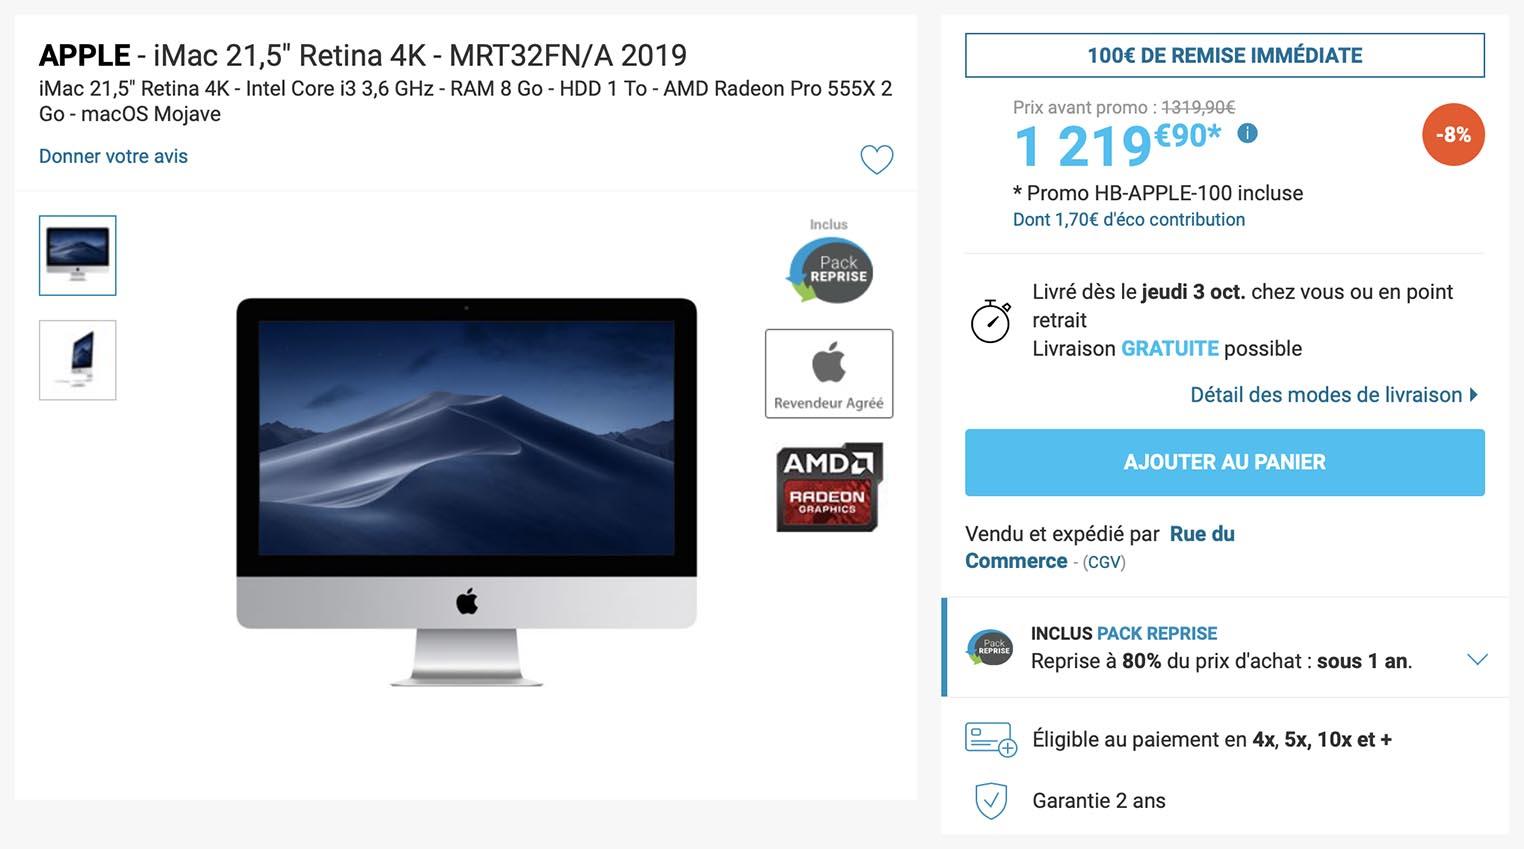 Promo iMac 2019 Rue du Commerce